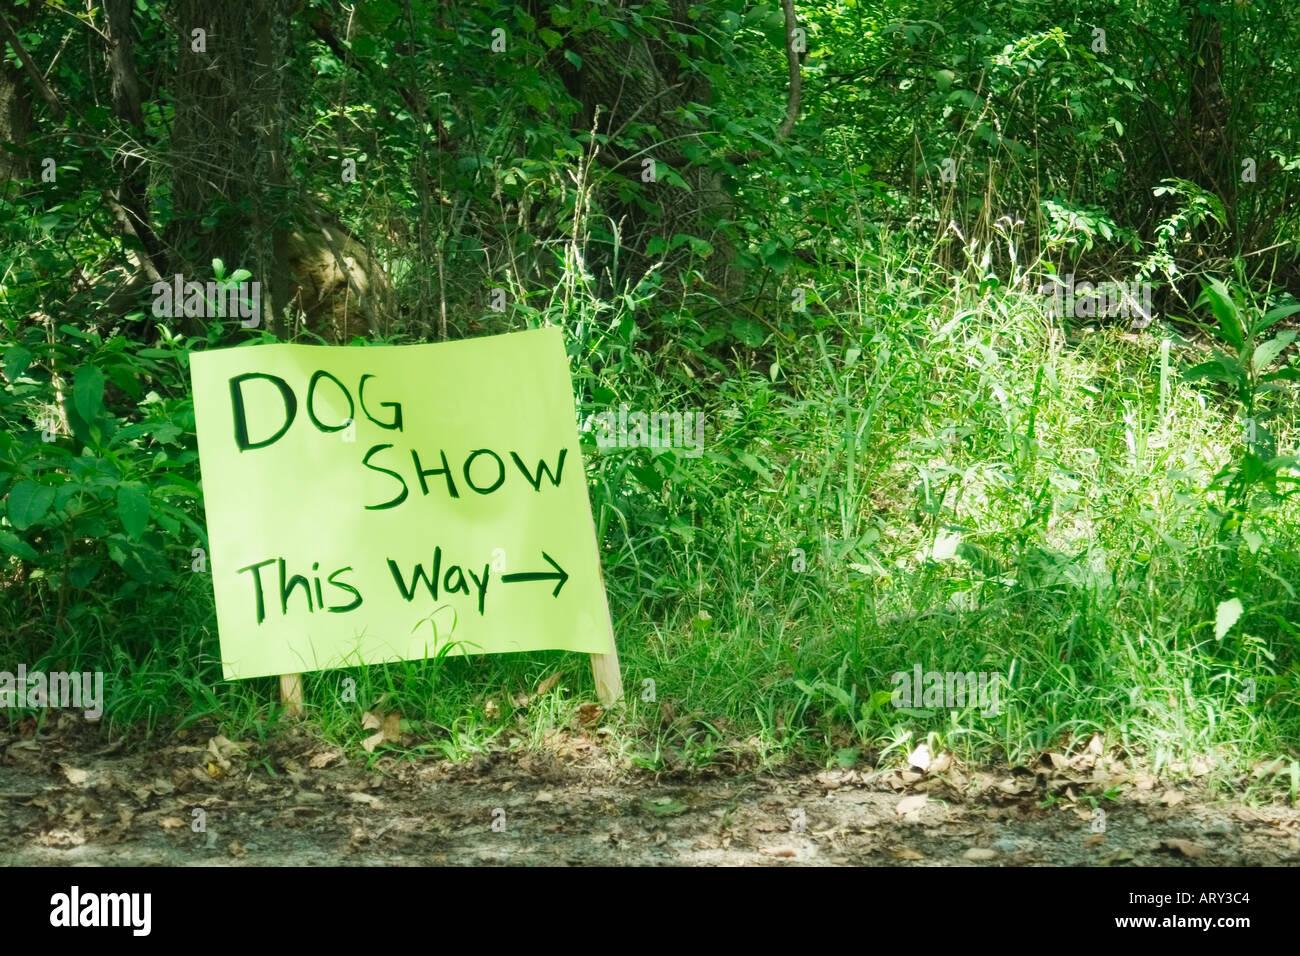 Dog show sign - Stock Image